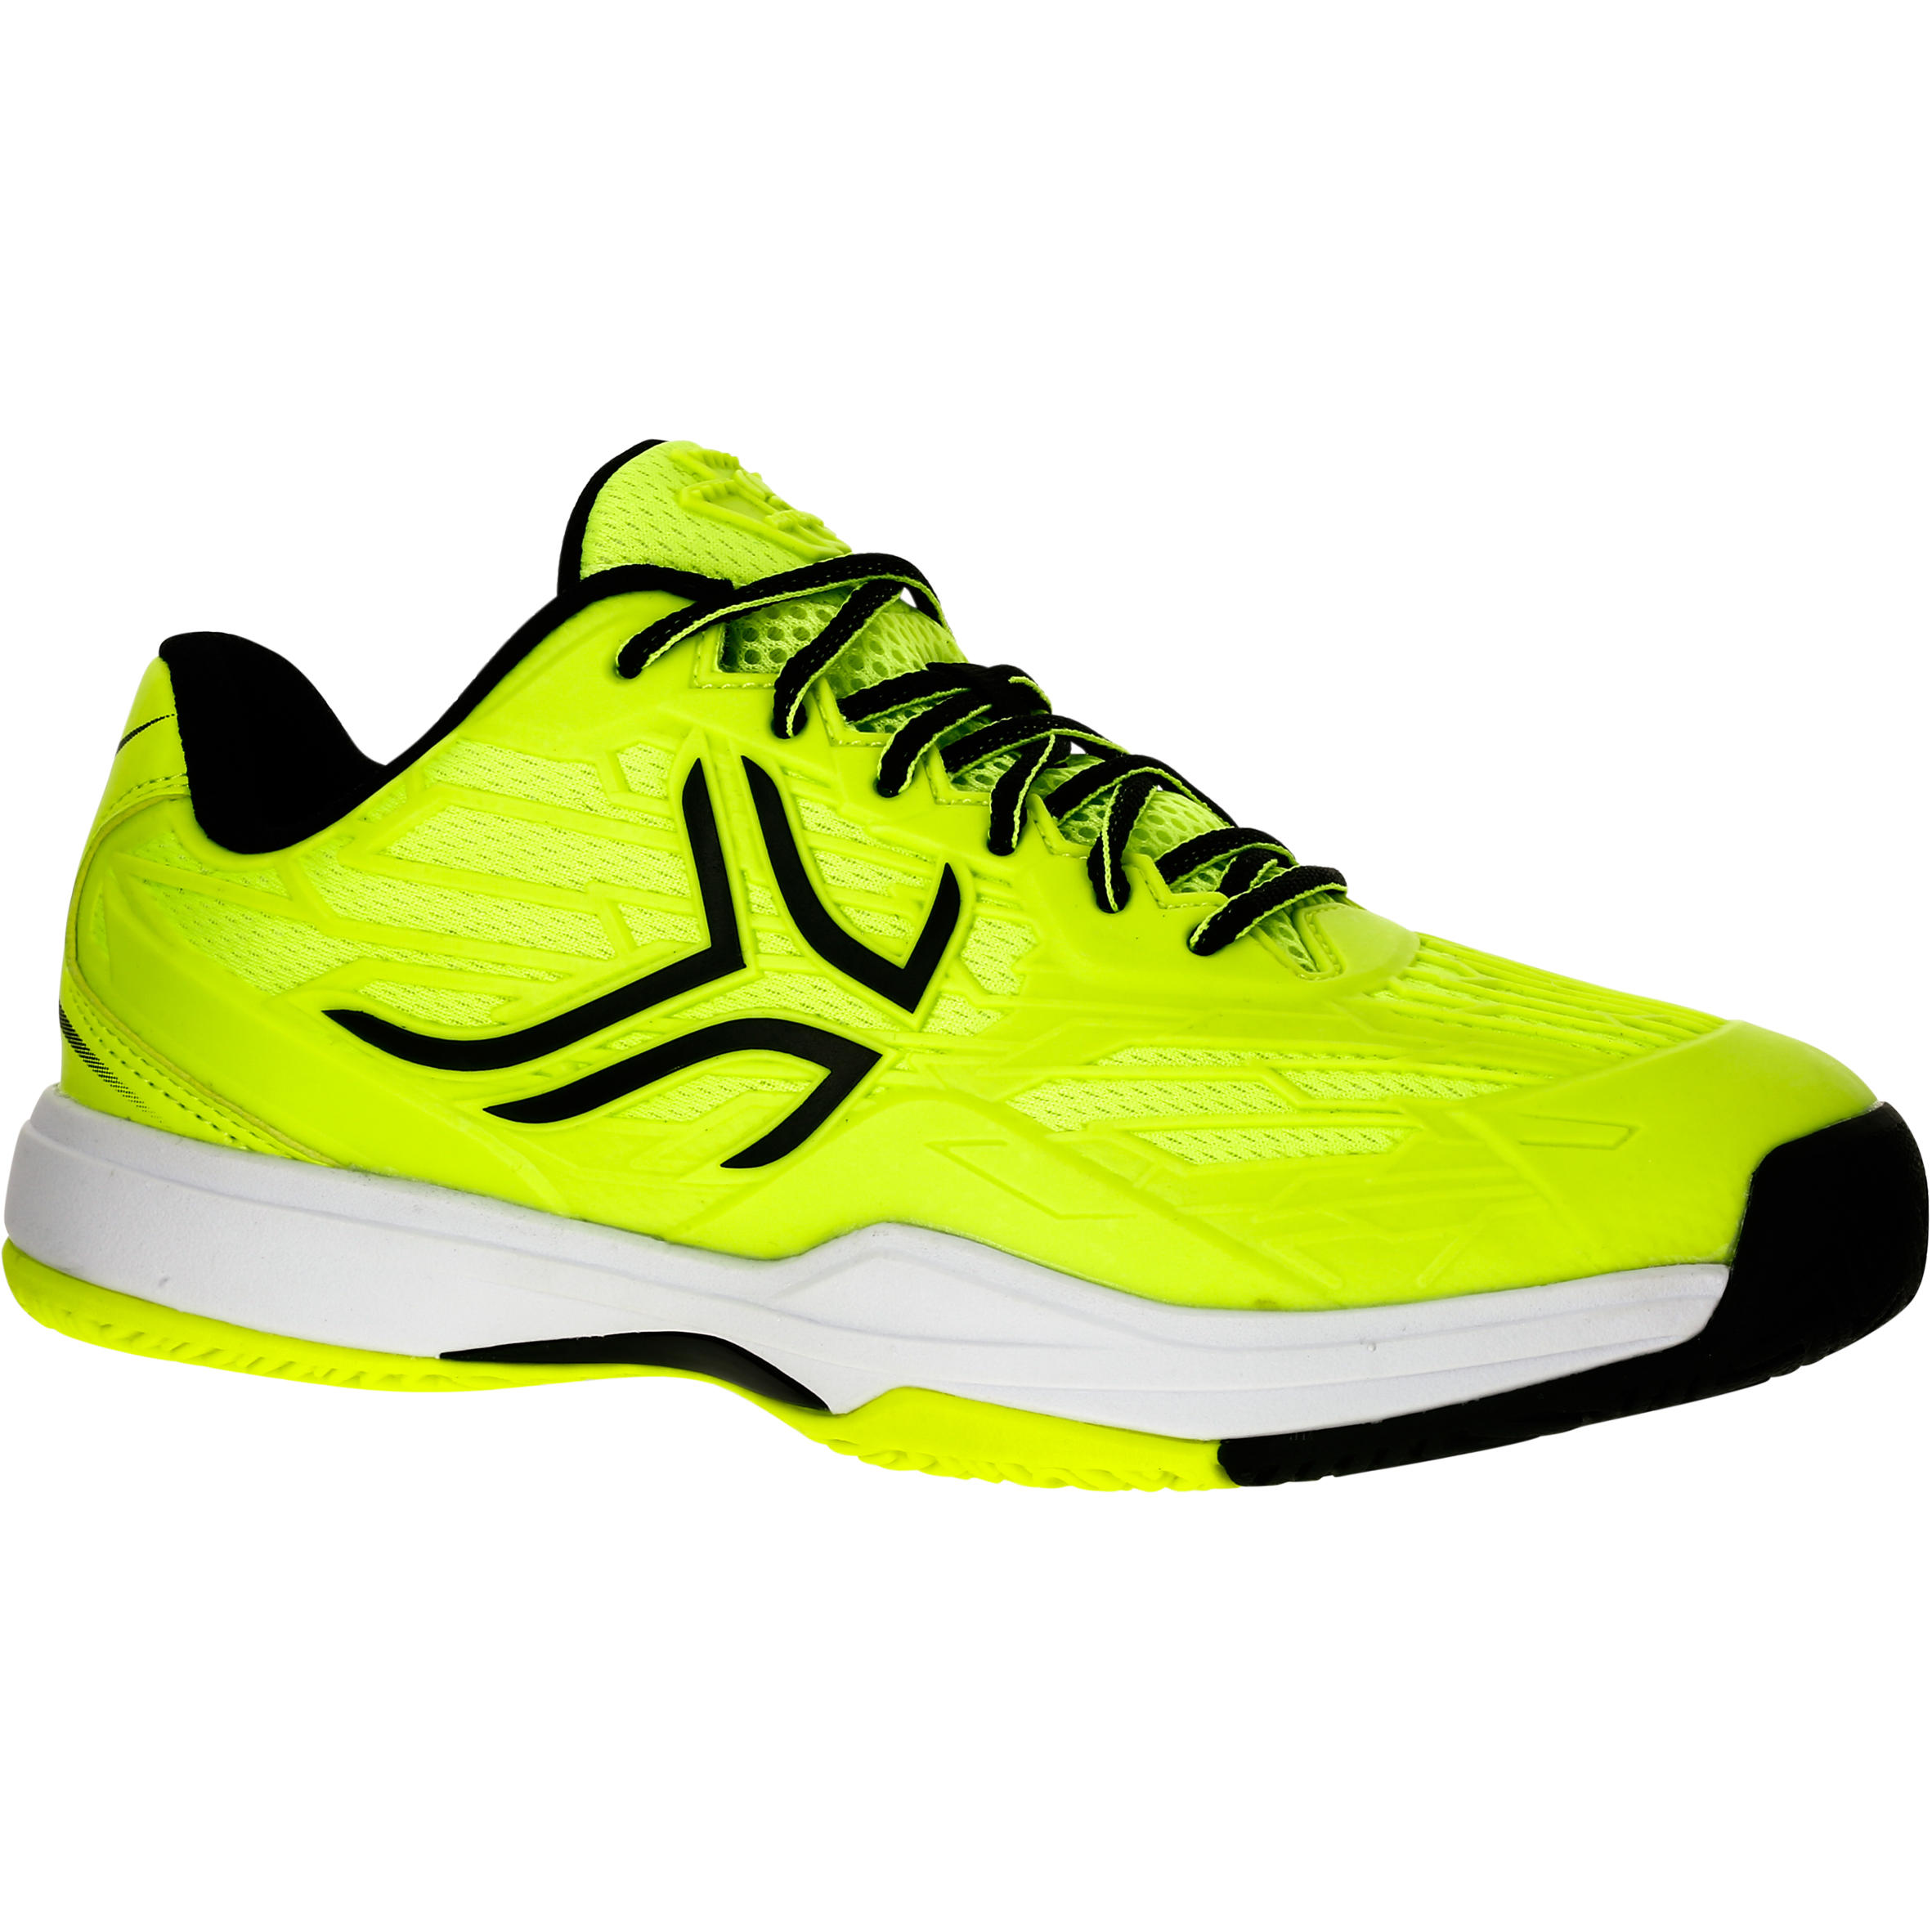 TS990 Kids Tennis Shoes - Neon Yellow